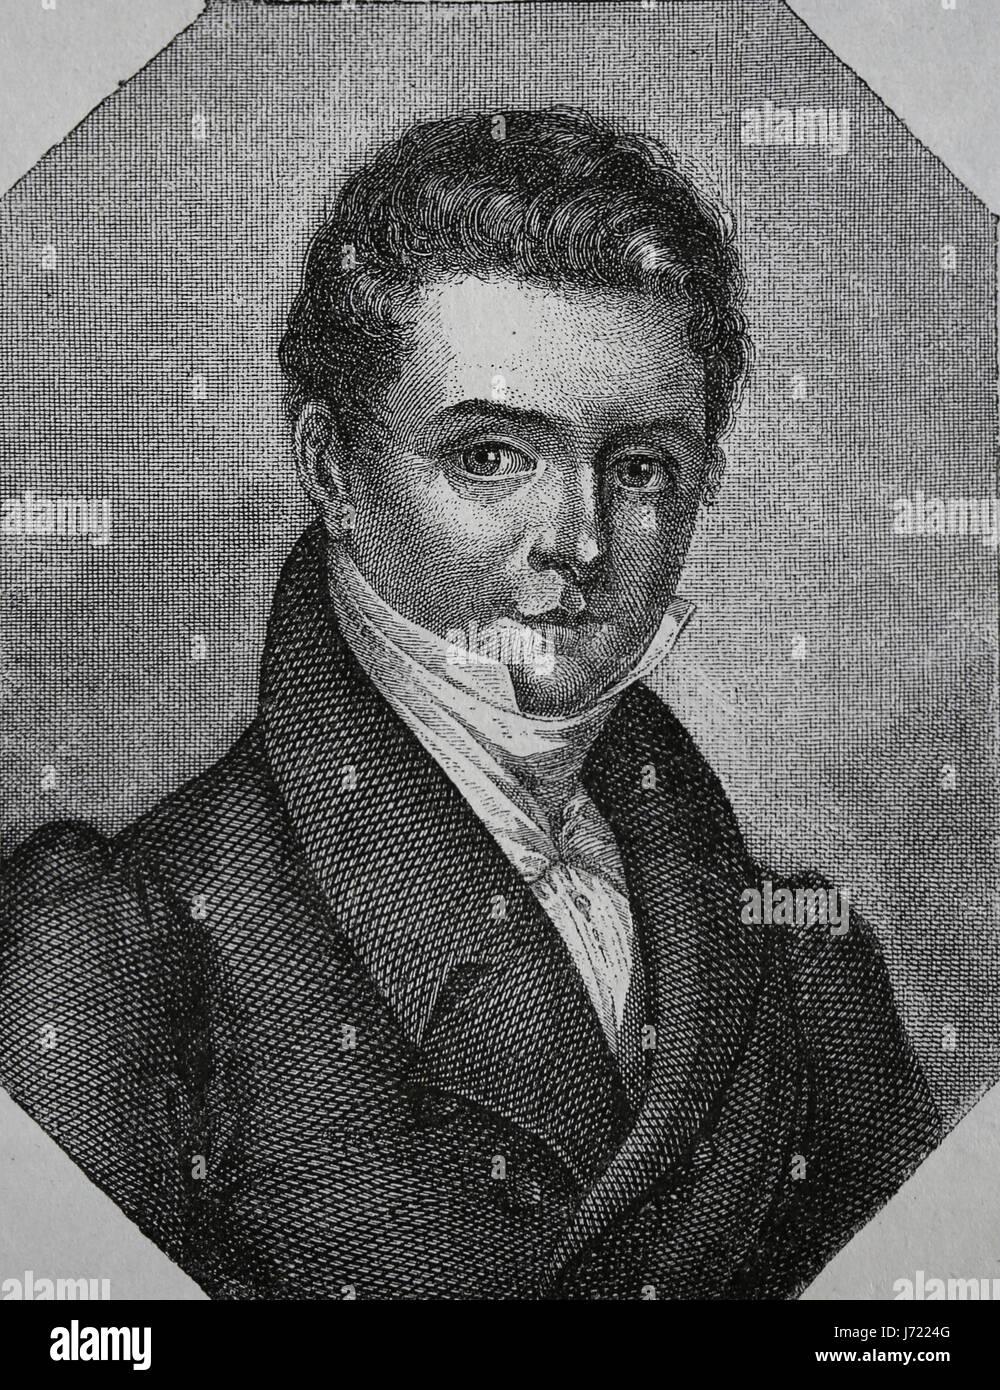 Washington Irving (1783-1859). US-amerikanischer Schriftsteller. Romantik. Gravur, unseres Jahrhunderts, 1883. Spanische Stockbild